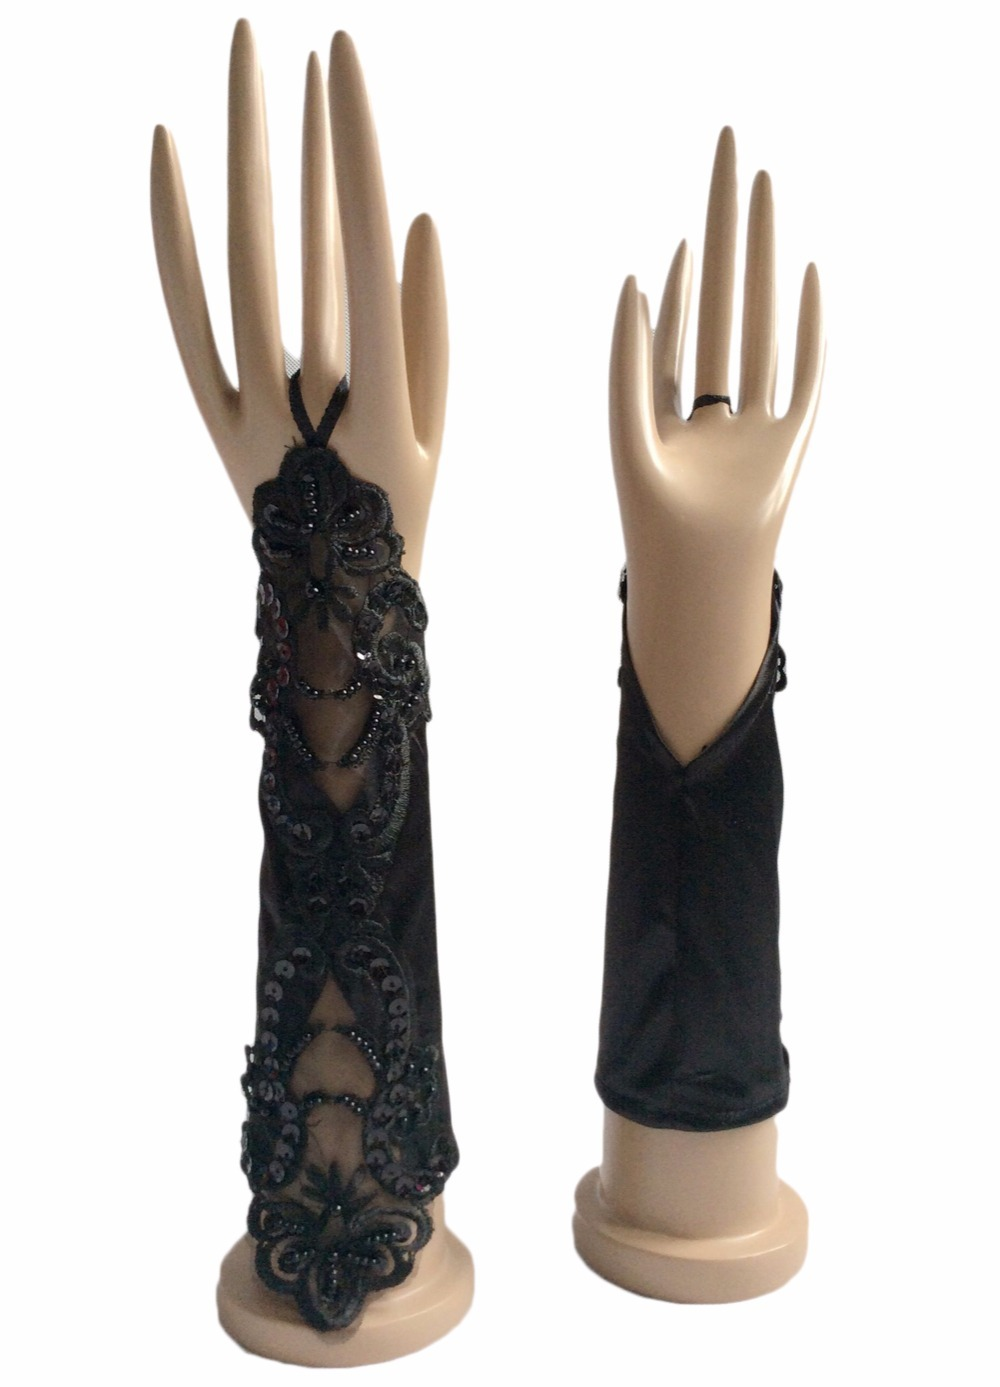 Fingerless Black White Ivory Bridal Gloves For Wedding Bride Cheap Lace Applique Accessories Guantes De Novia